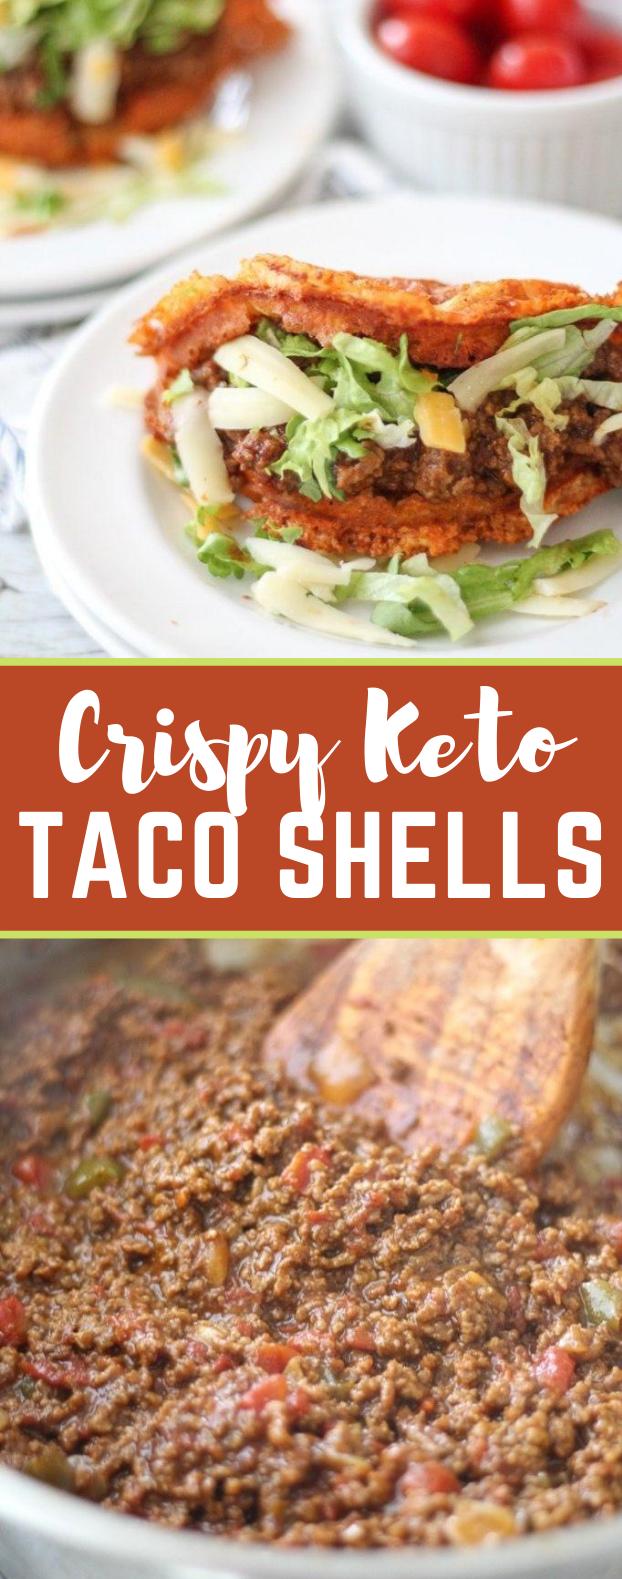 TACO CHAFFLE RECIPE: DELICIOUS CRISPY KETO TACO SHELLS #lowcarb #diet #healthy #ketogenic #taco